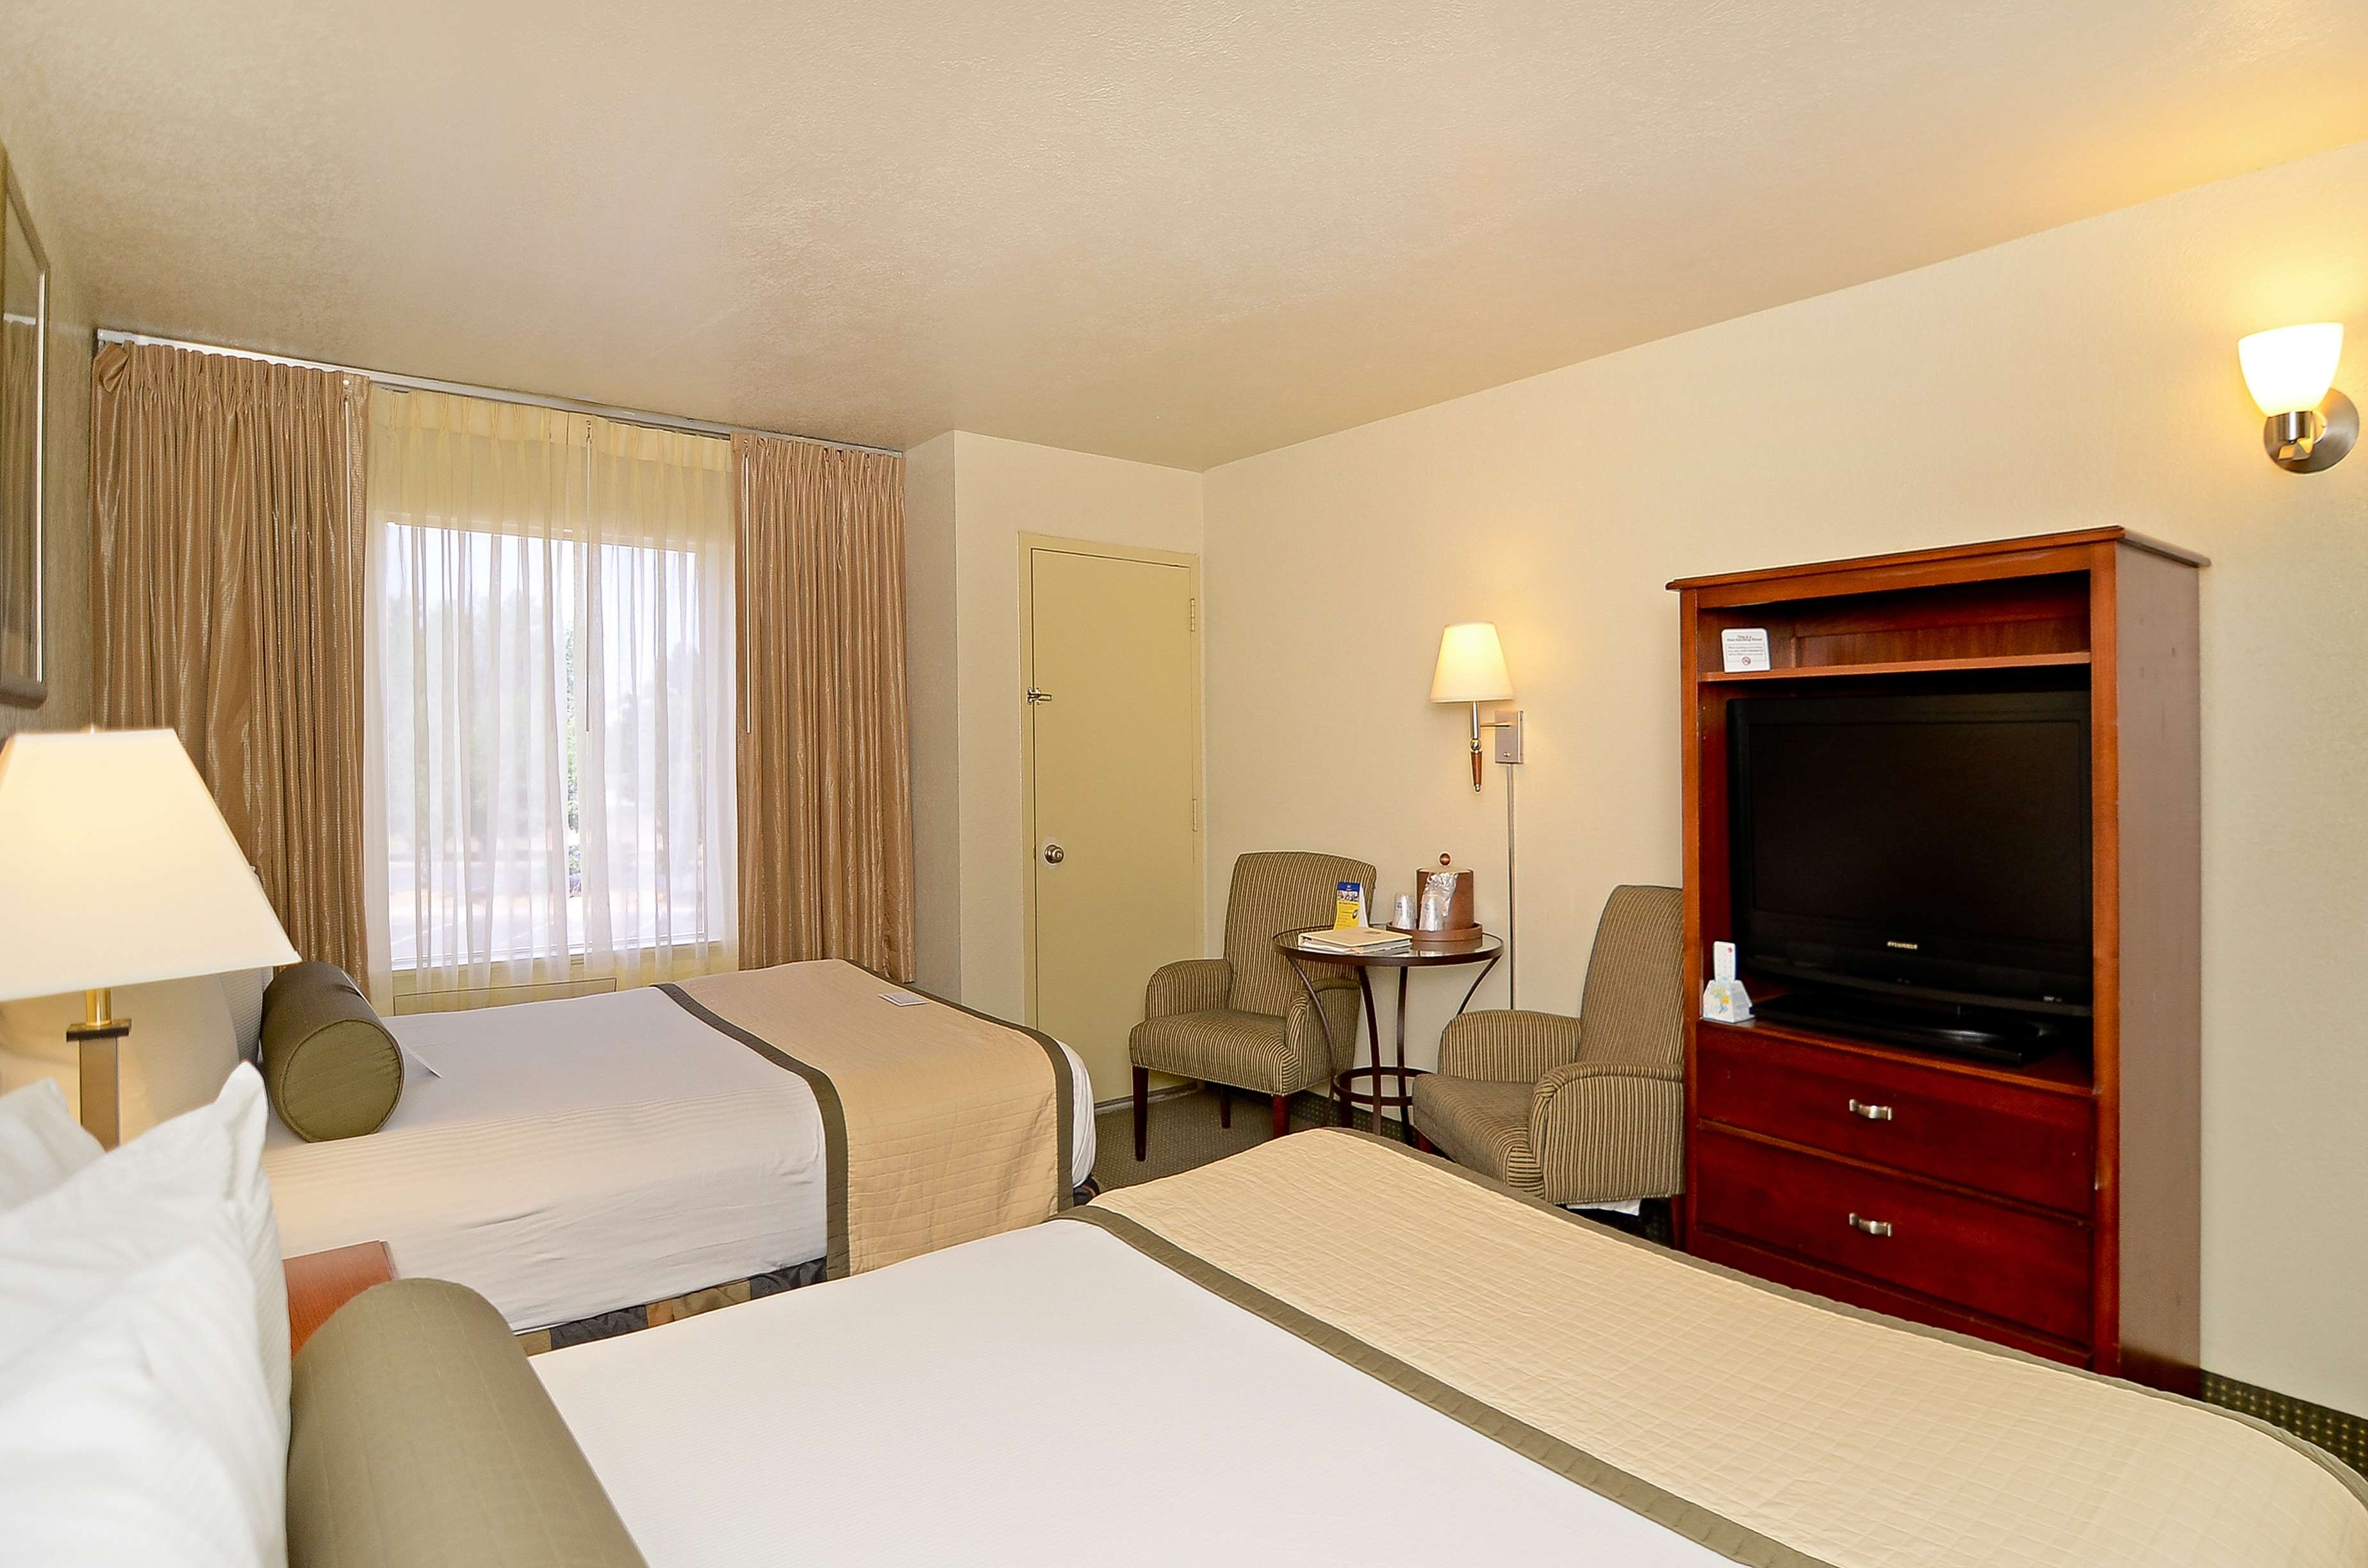 Best Western Plus Lawton Hotel & Convention Center image 46